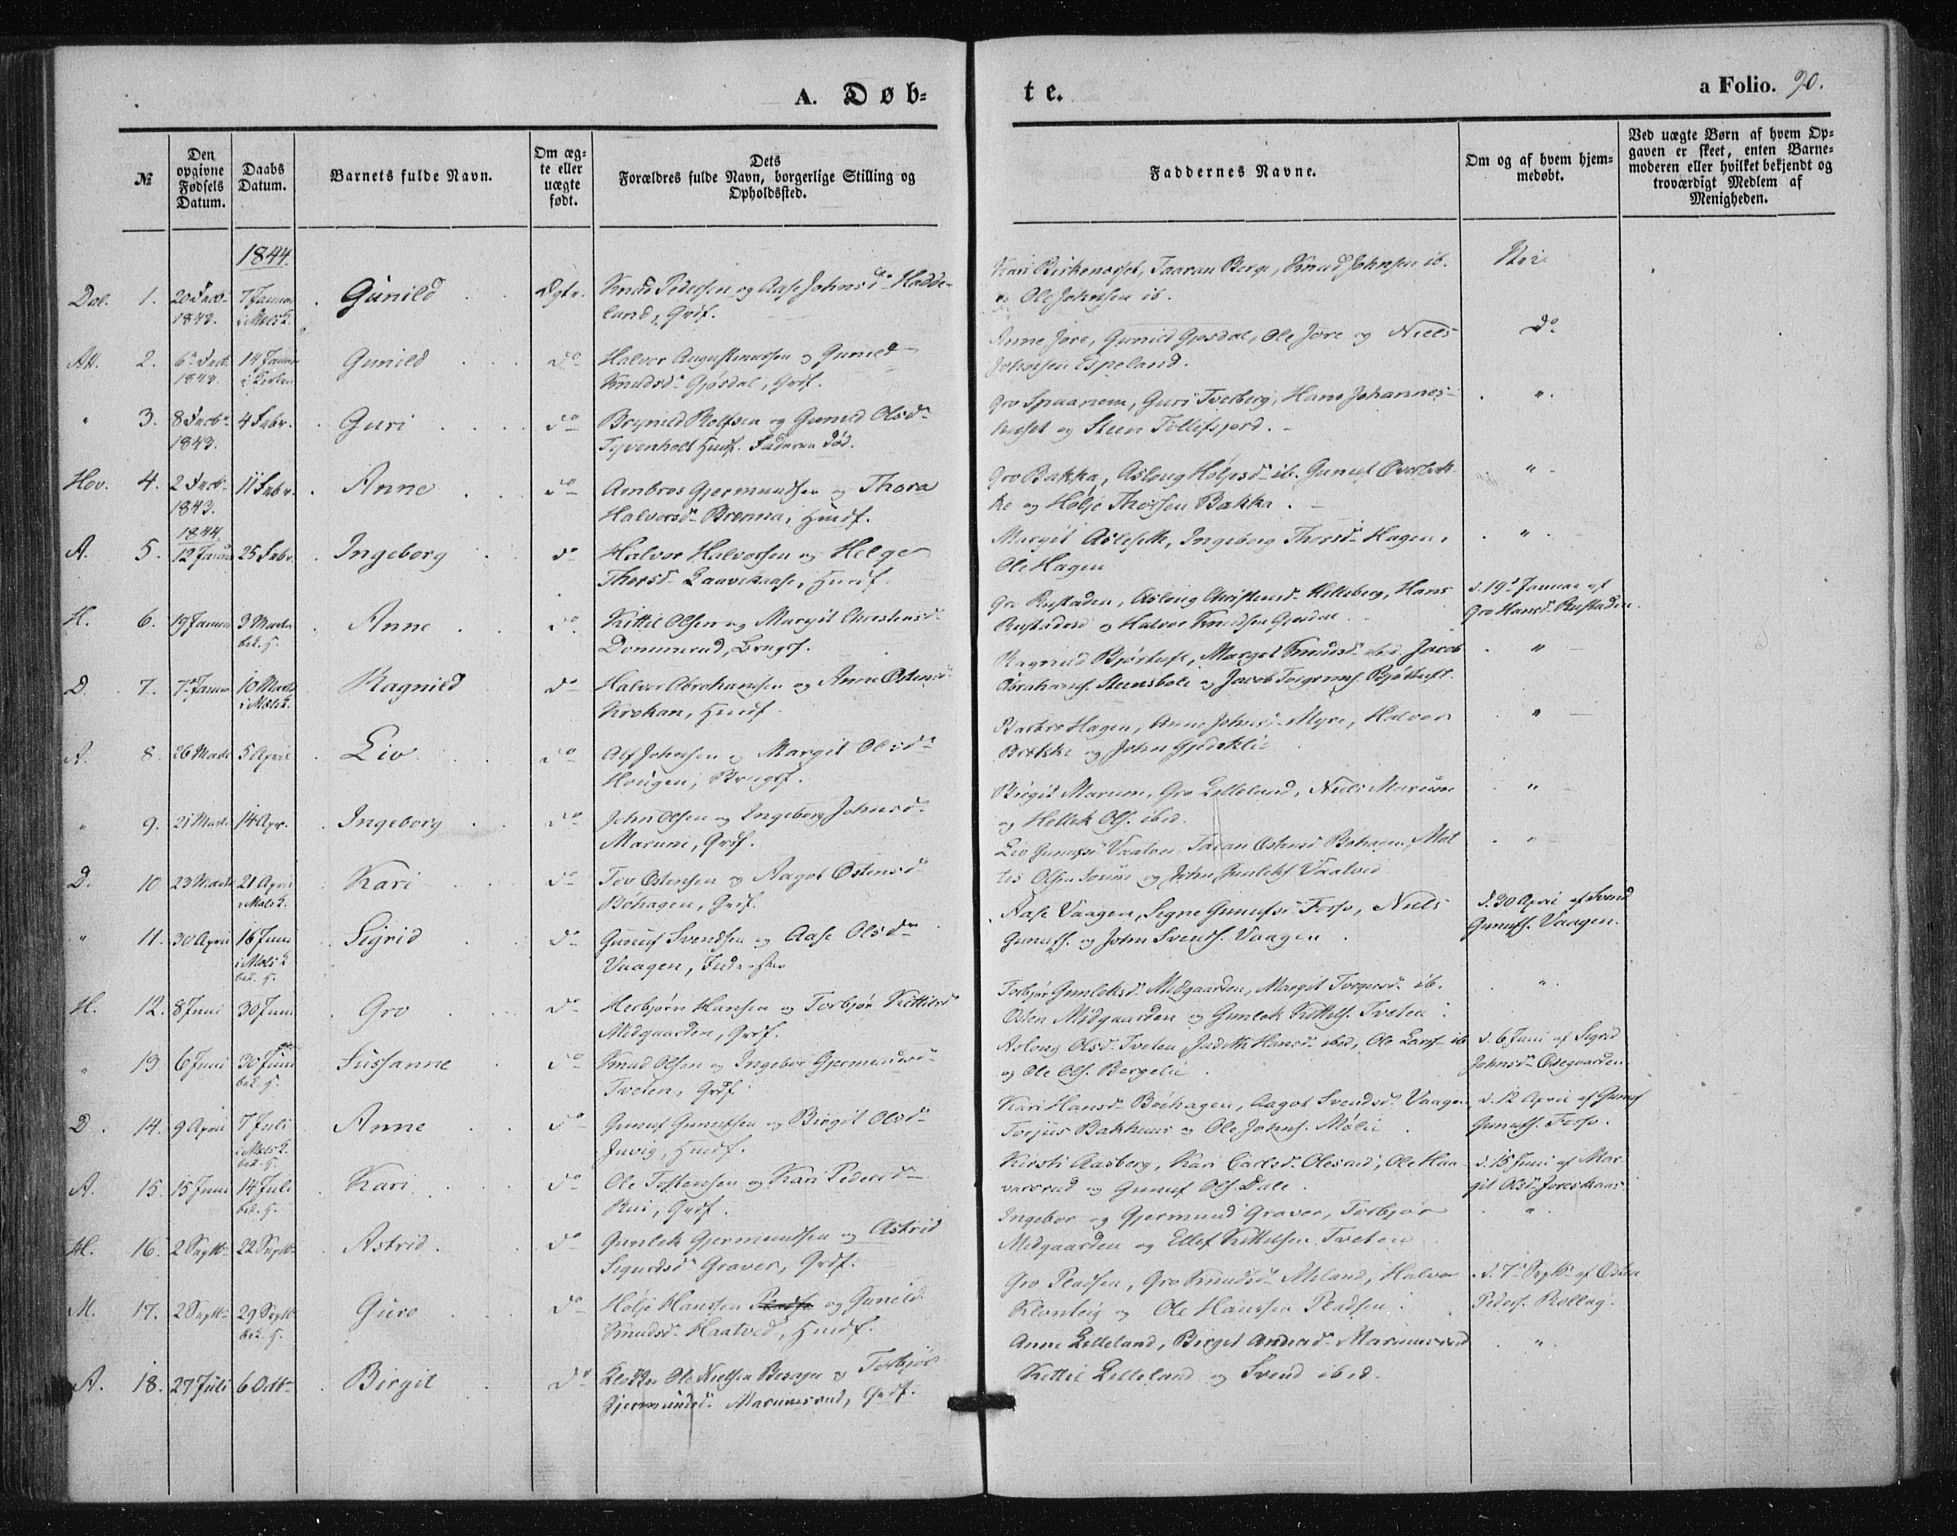 SAKO, Tinn kirkebøker, F/Fa/L0005: Ministerialbok nr. I 5, 1844-1856, s. 90